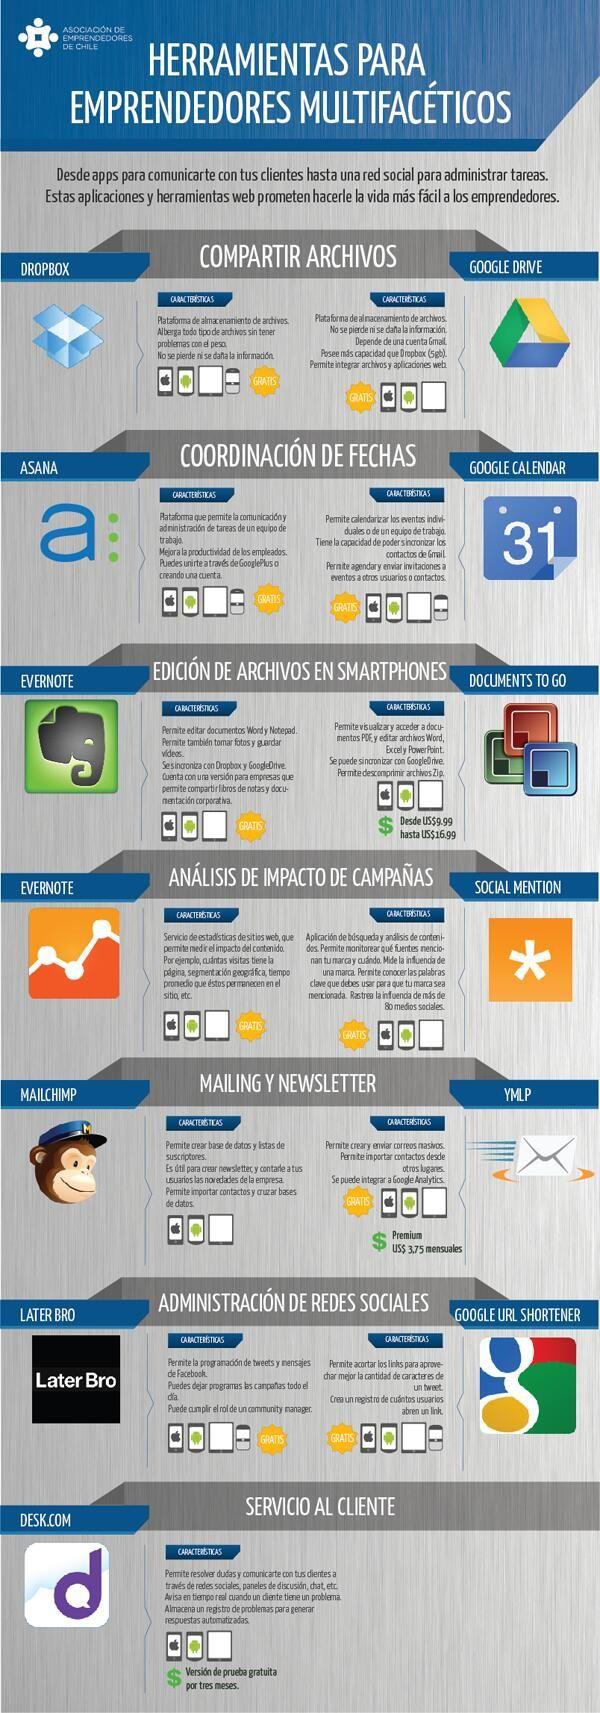 Herramientas para emprendedores polifacéticos #infografia #infographic #entrepreneurship